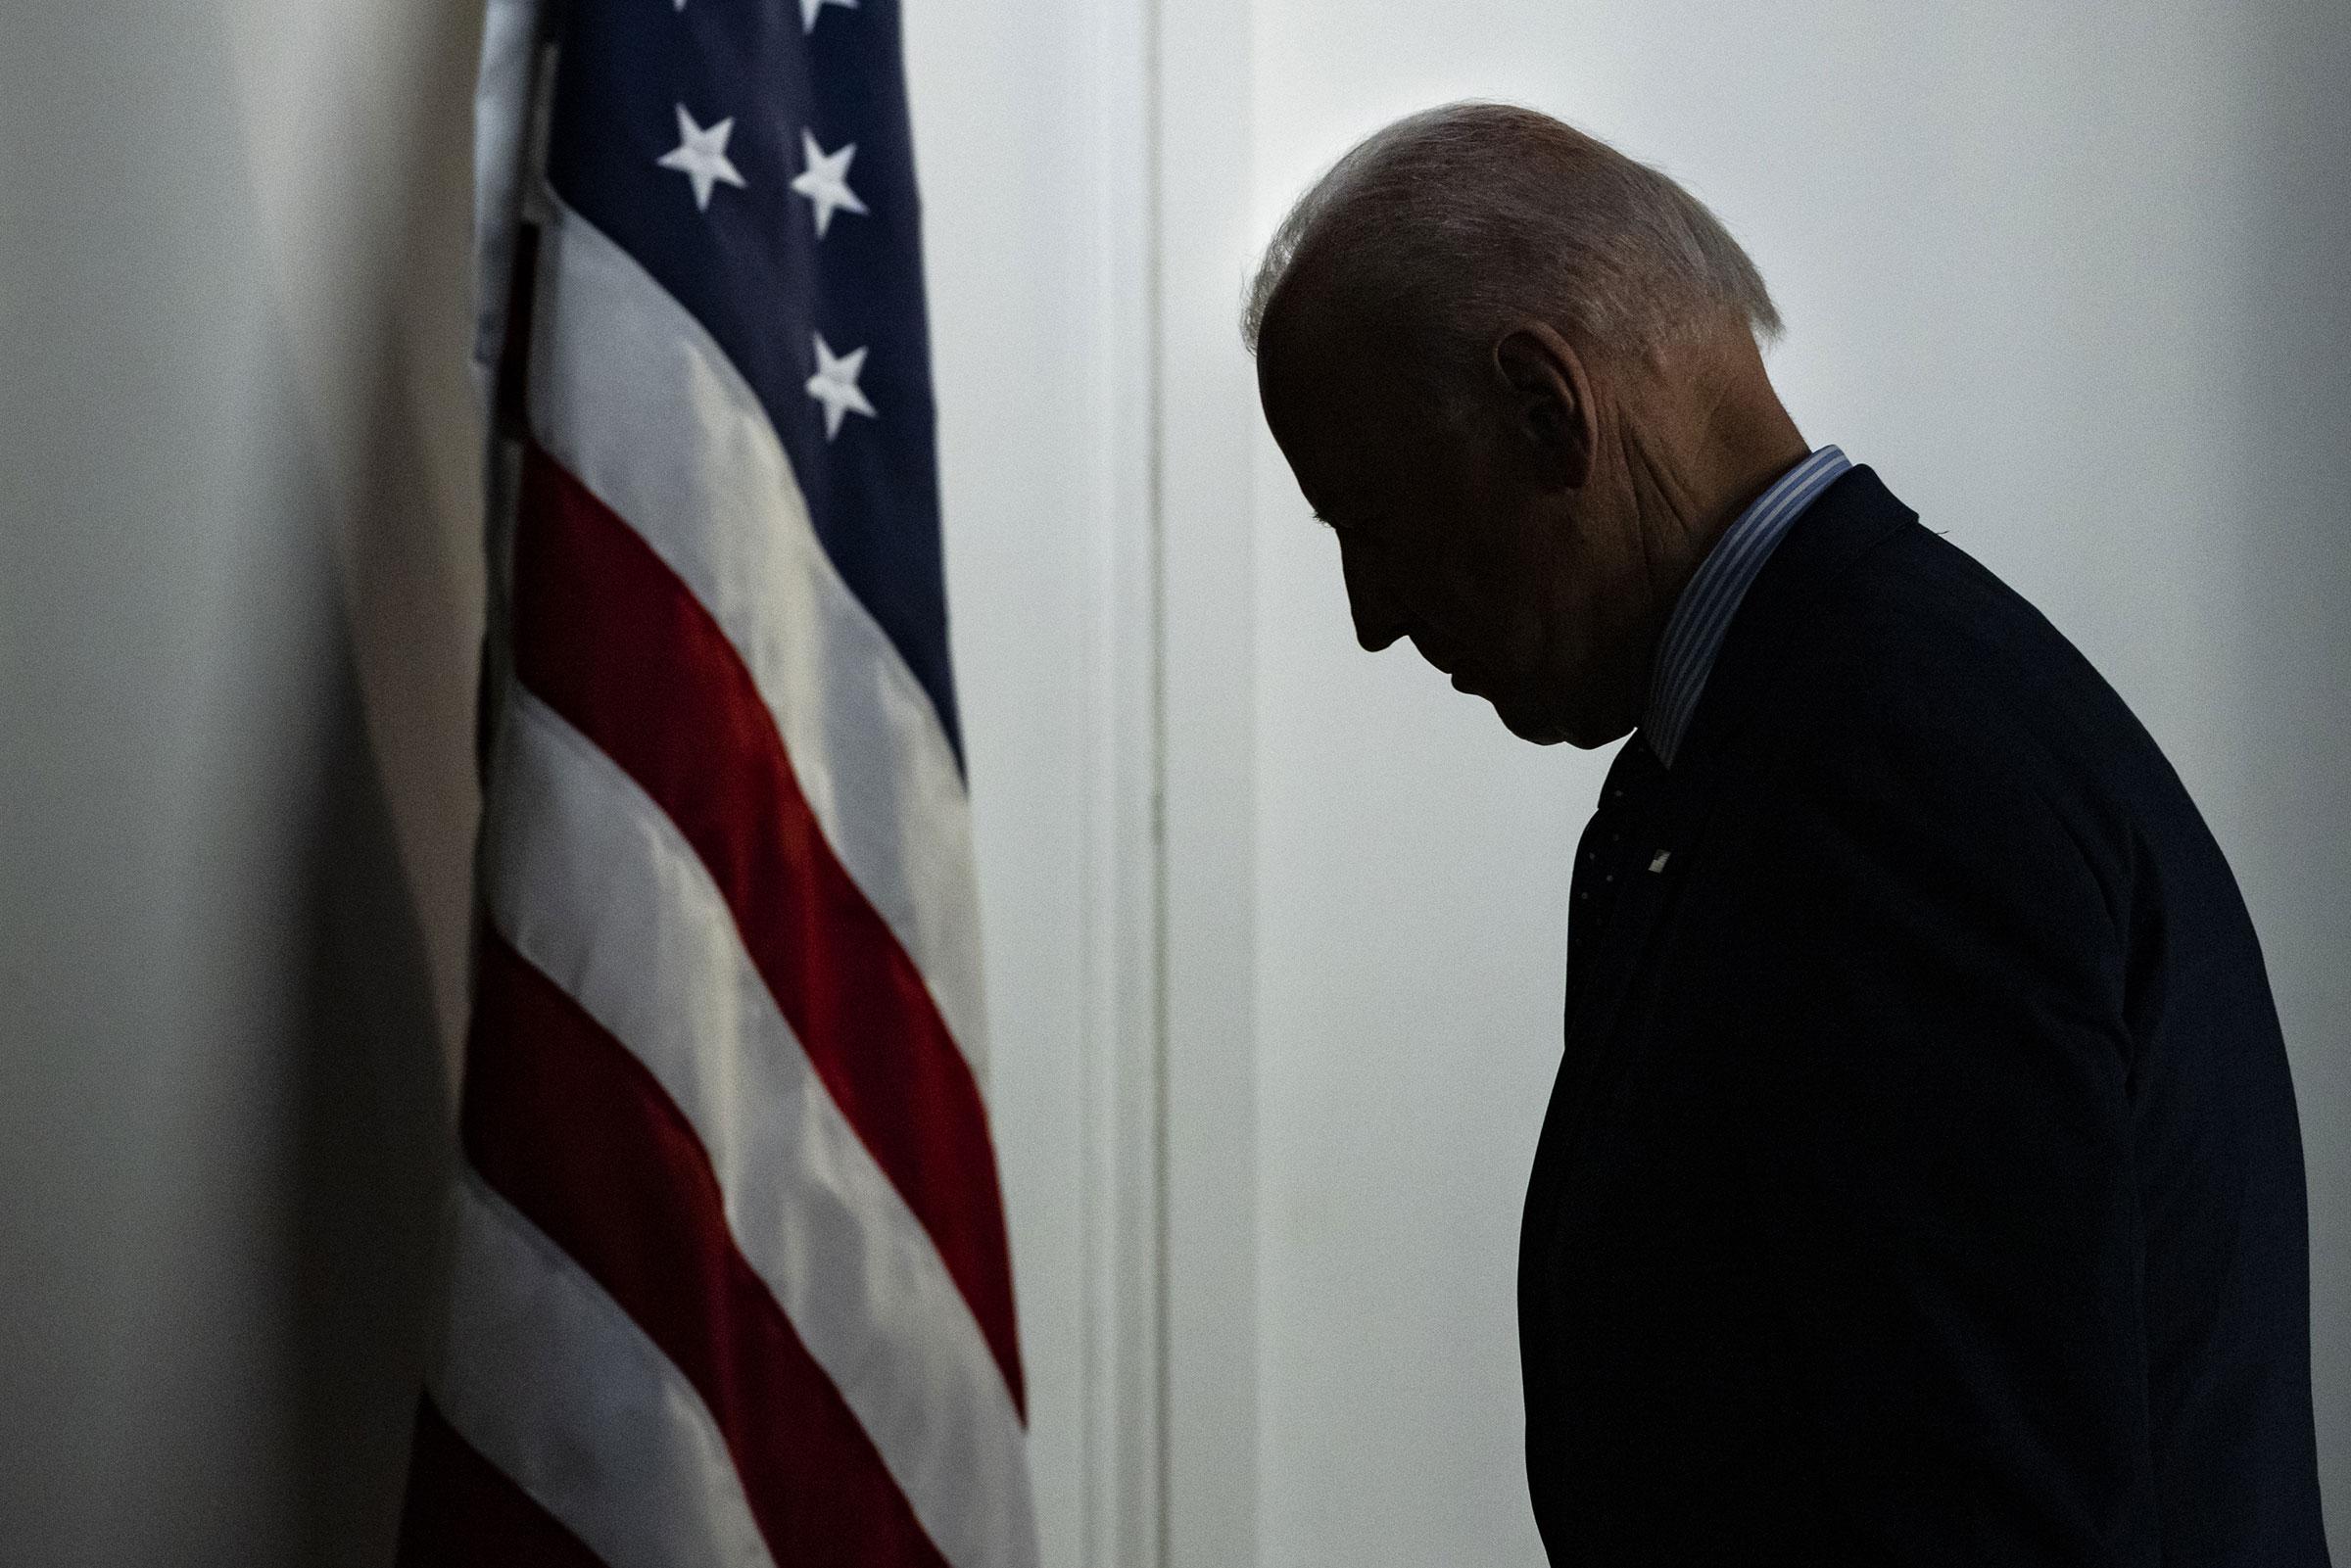 President Joe Biden departs after speaking in the Eisenhower Executive Office Building in Washington on June 2, 2021.